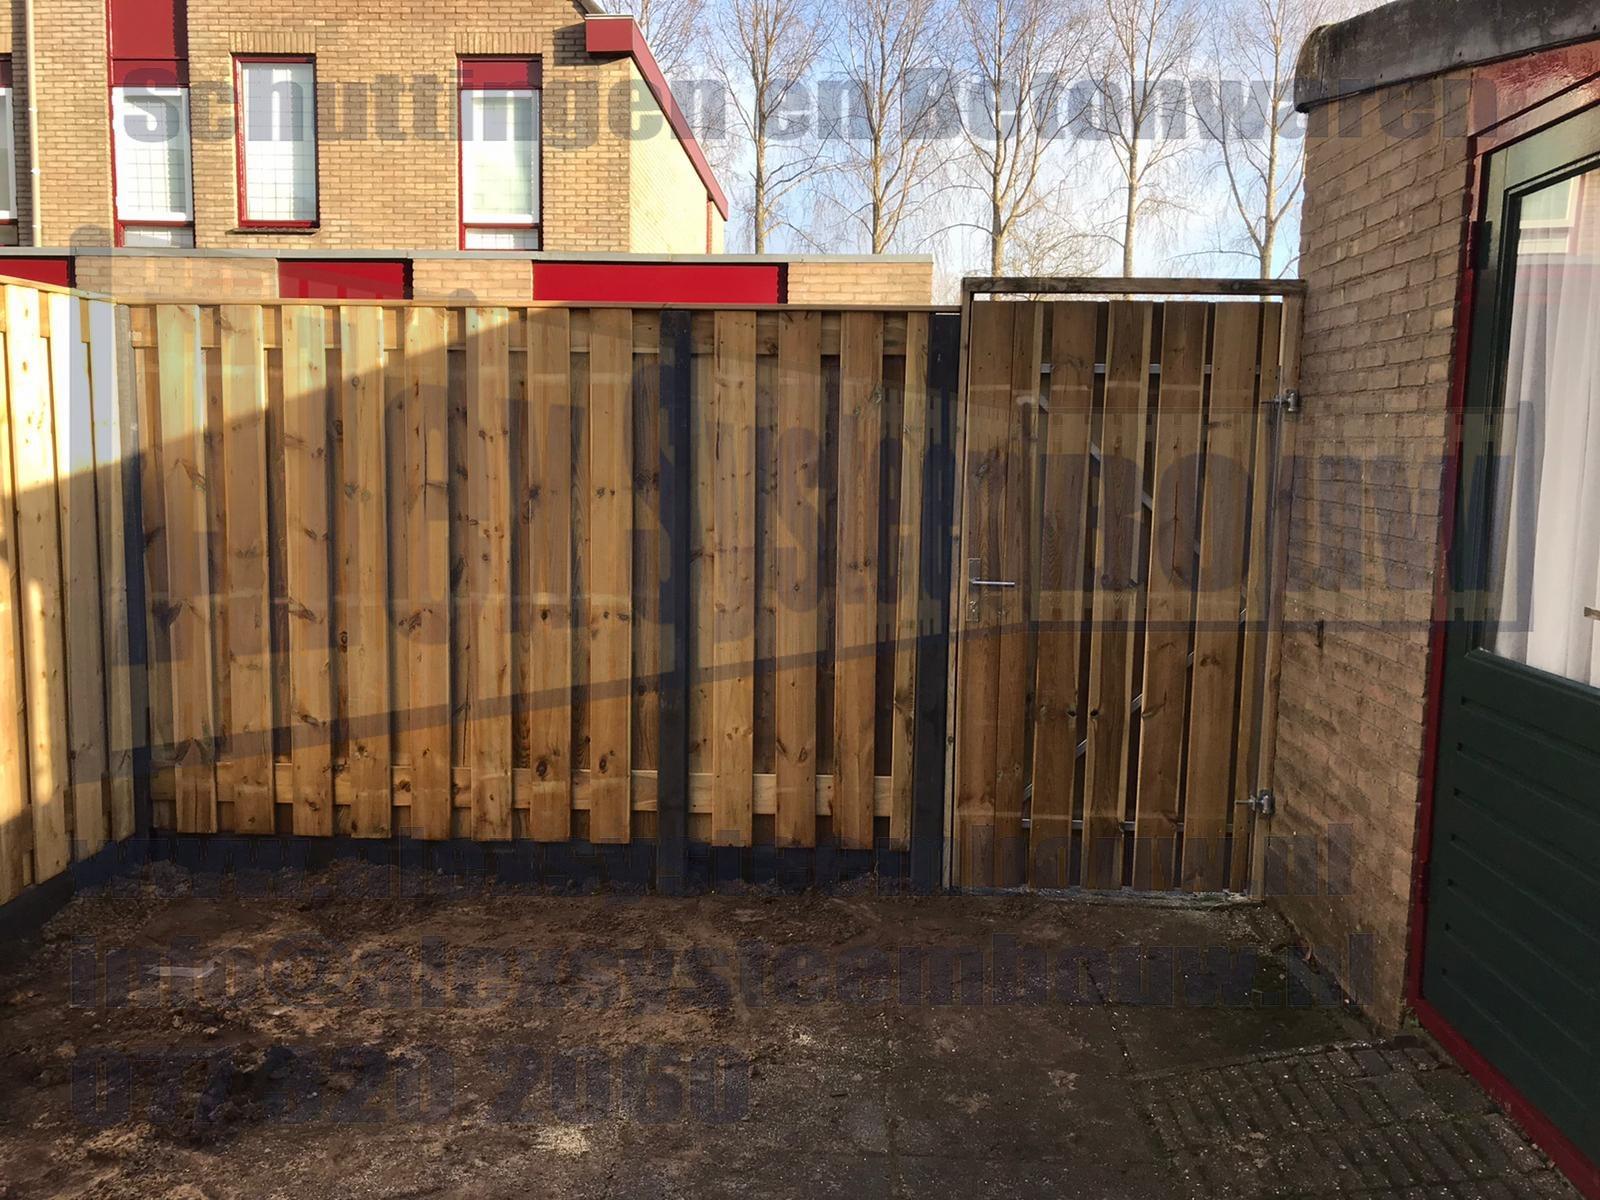 Schutting 19 planks tuinschermen incl. poort